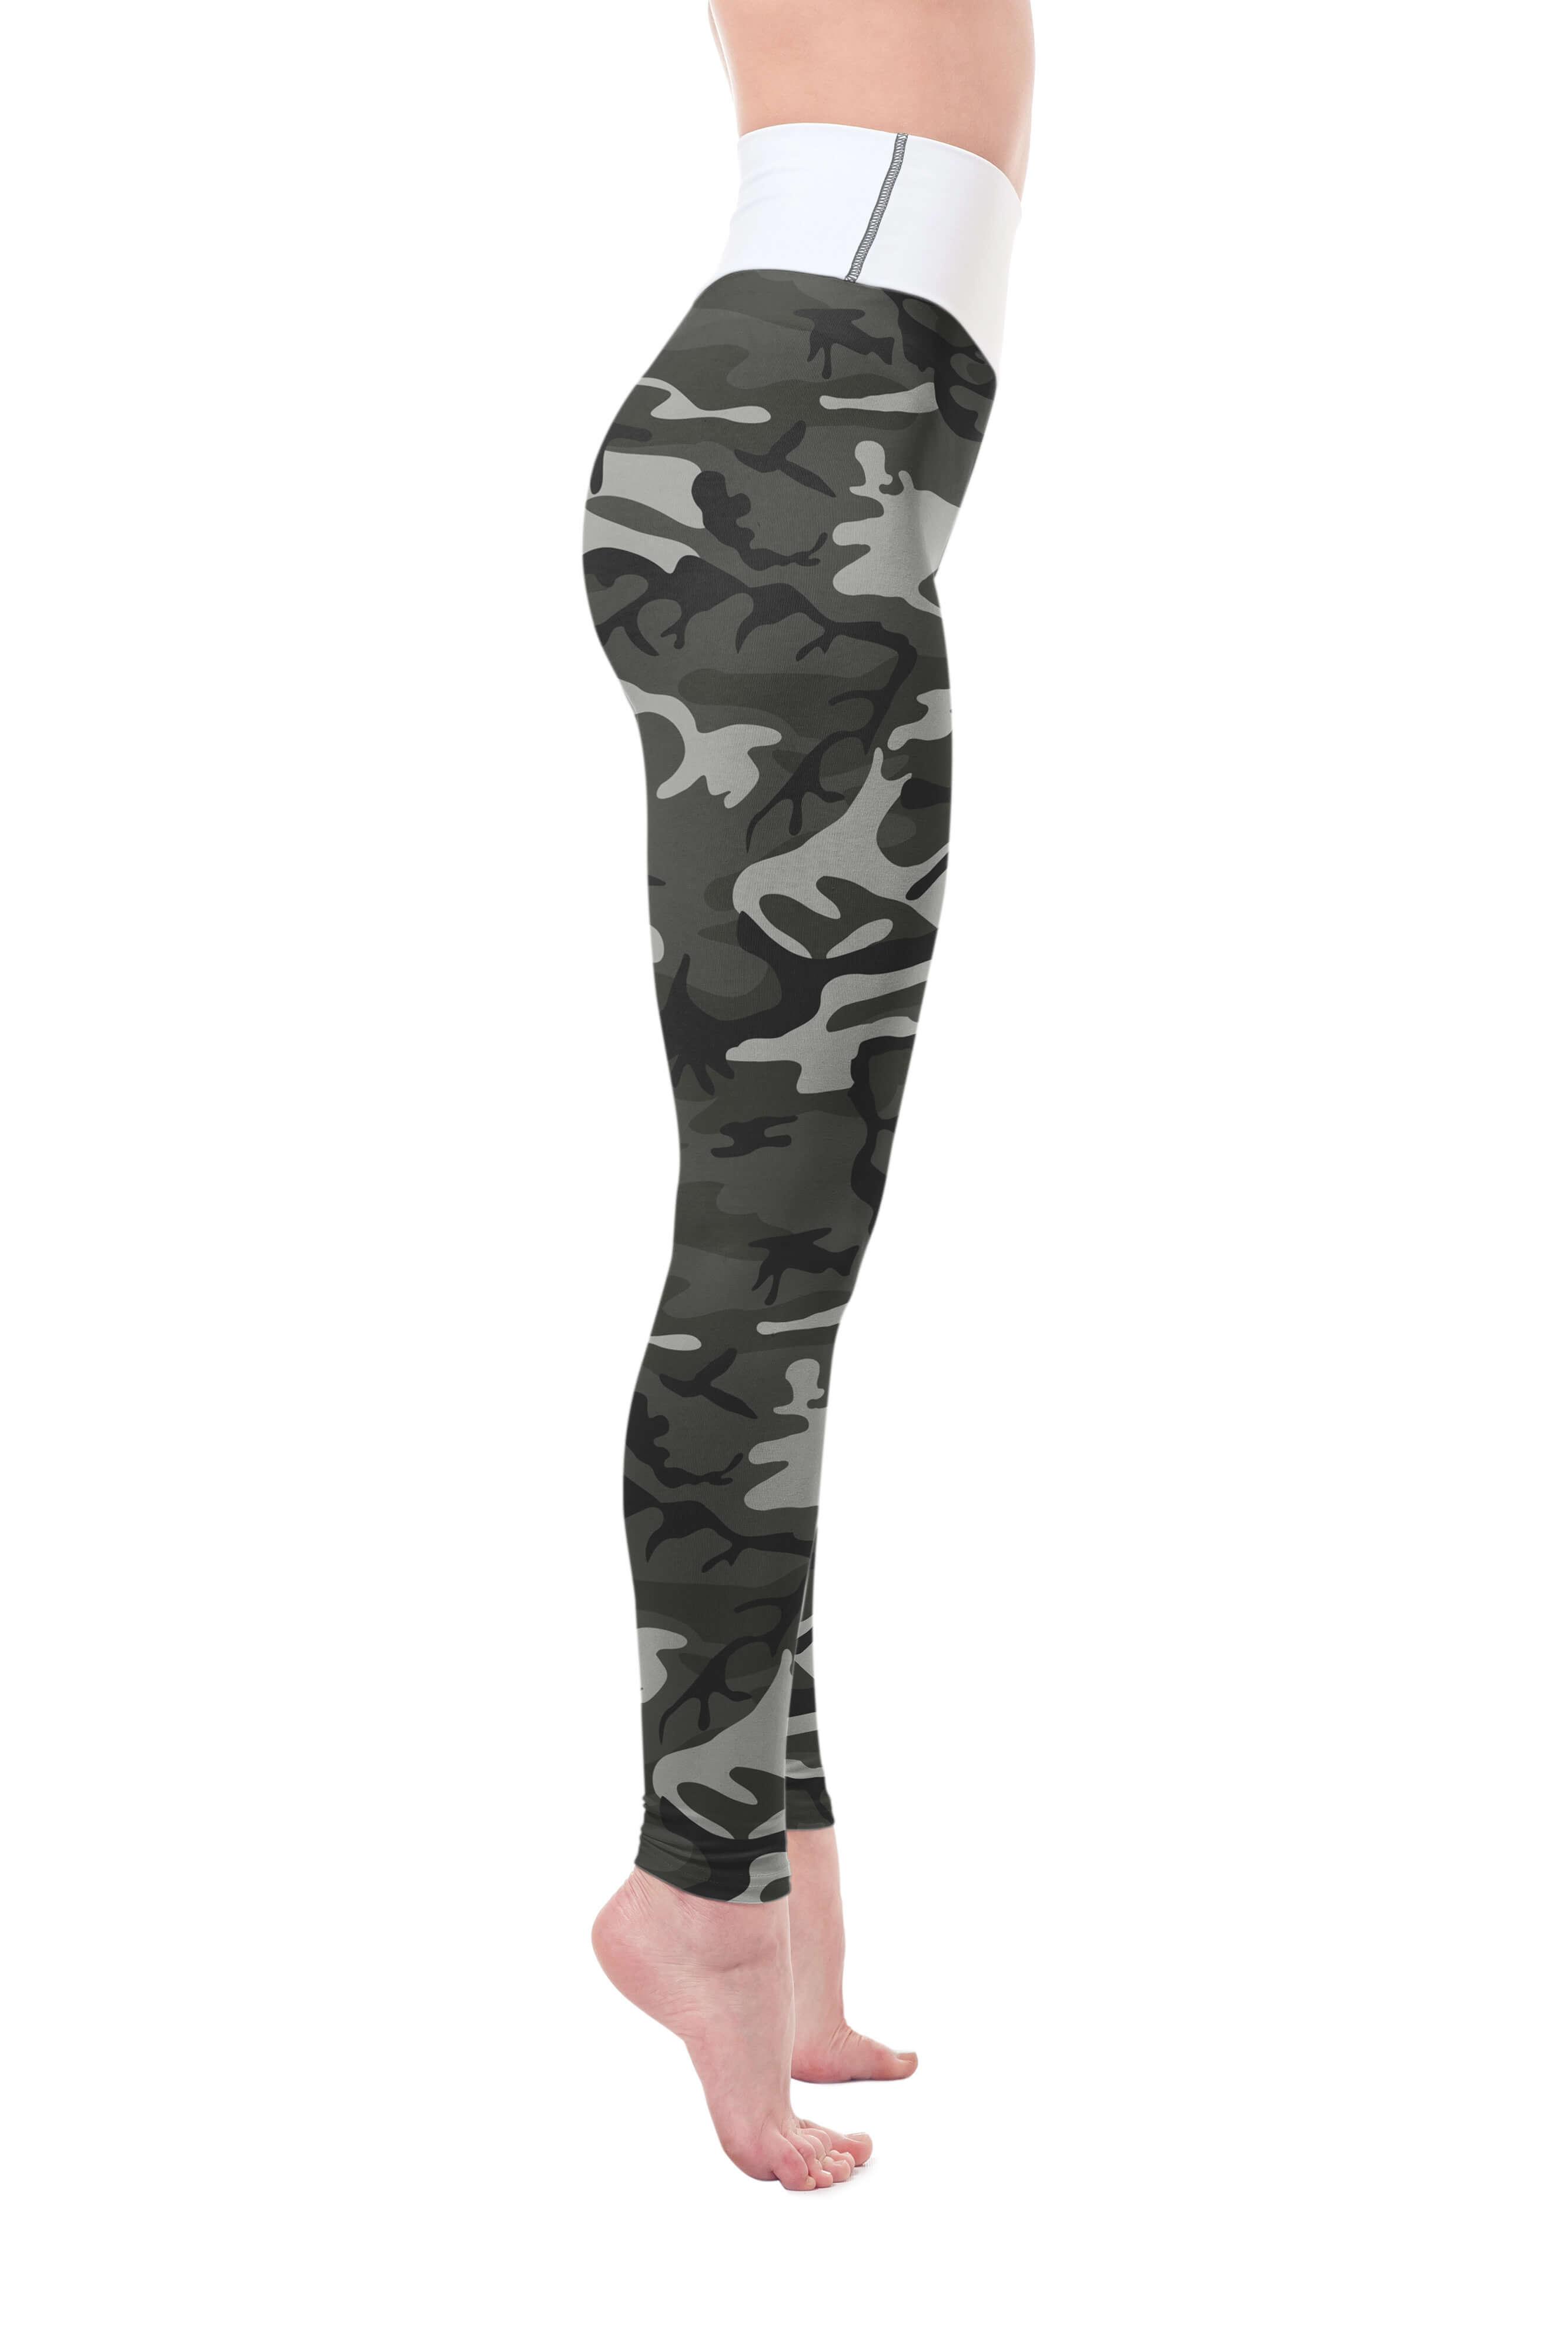 Army Camo Yoga Leggings Raised Waistband